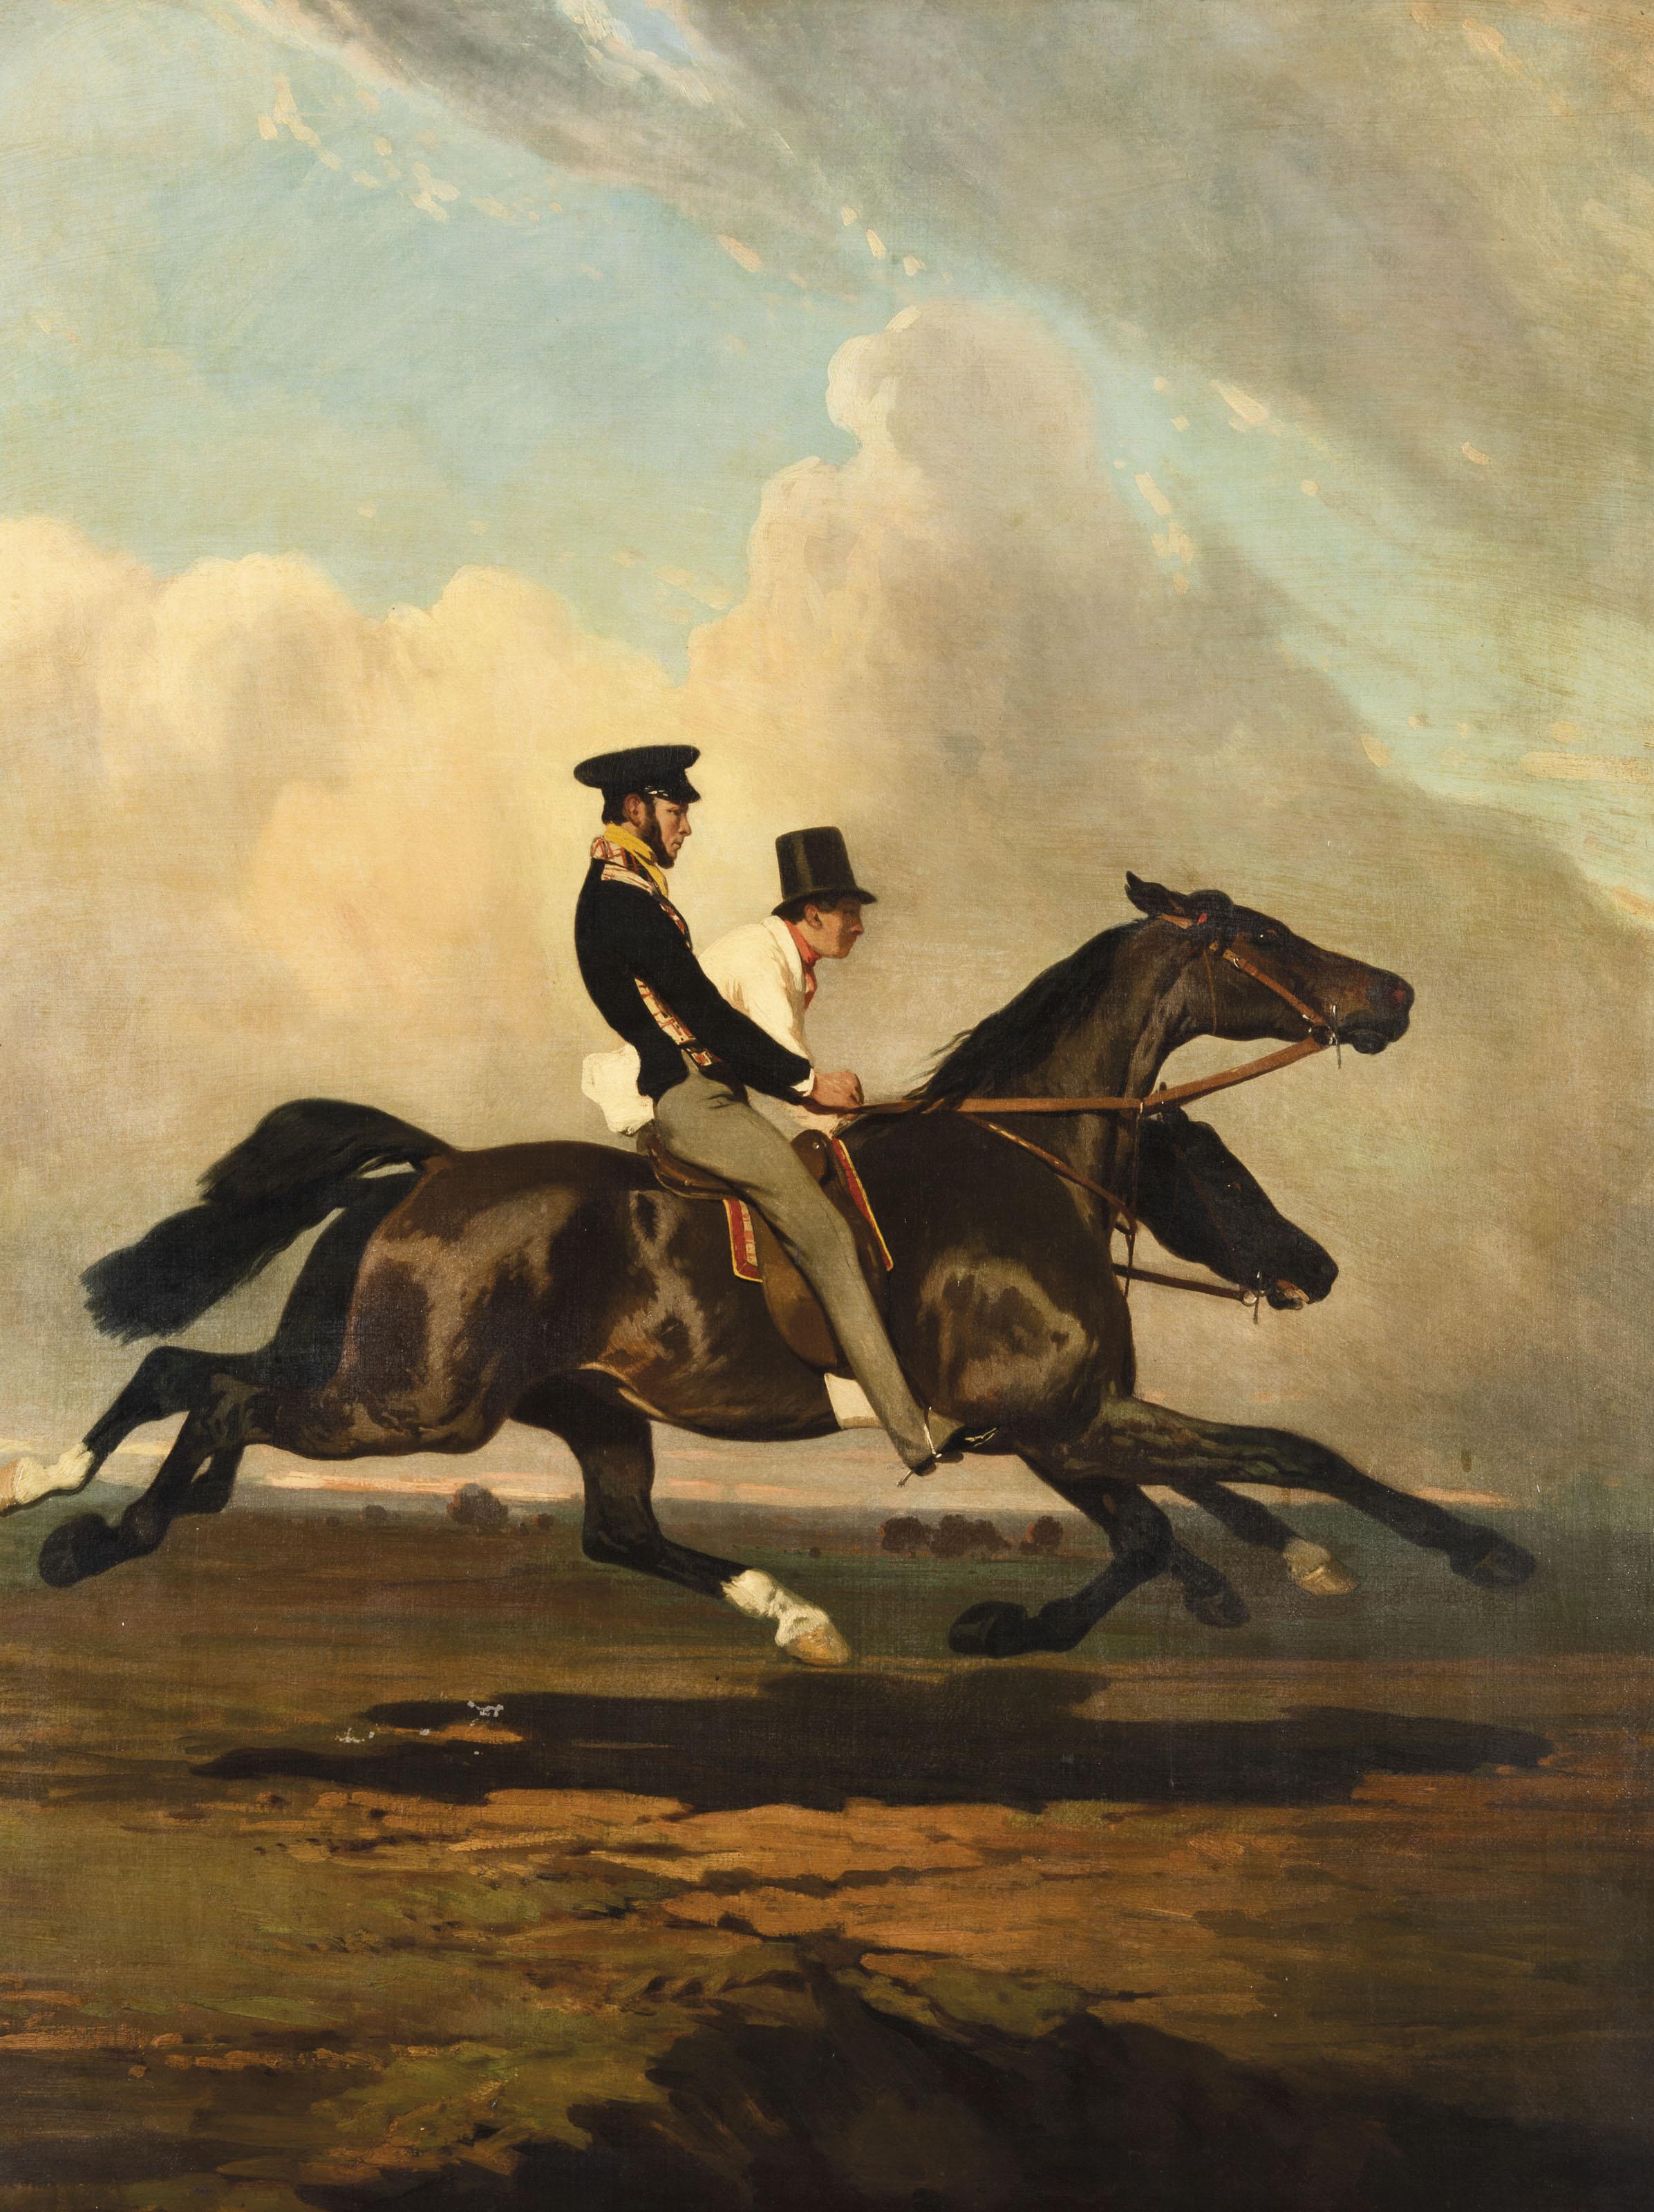 Alfred de Dreux (French, 1808-